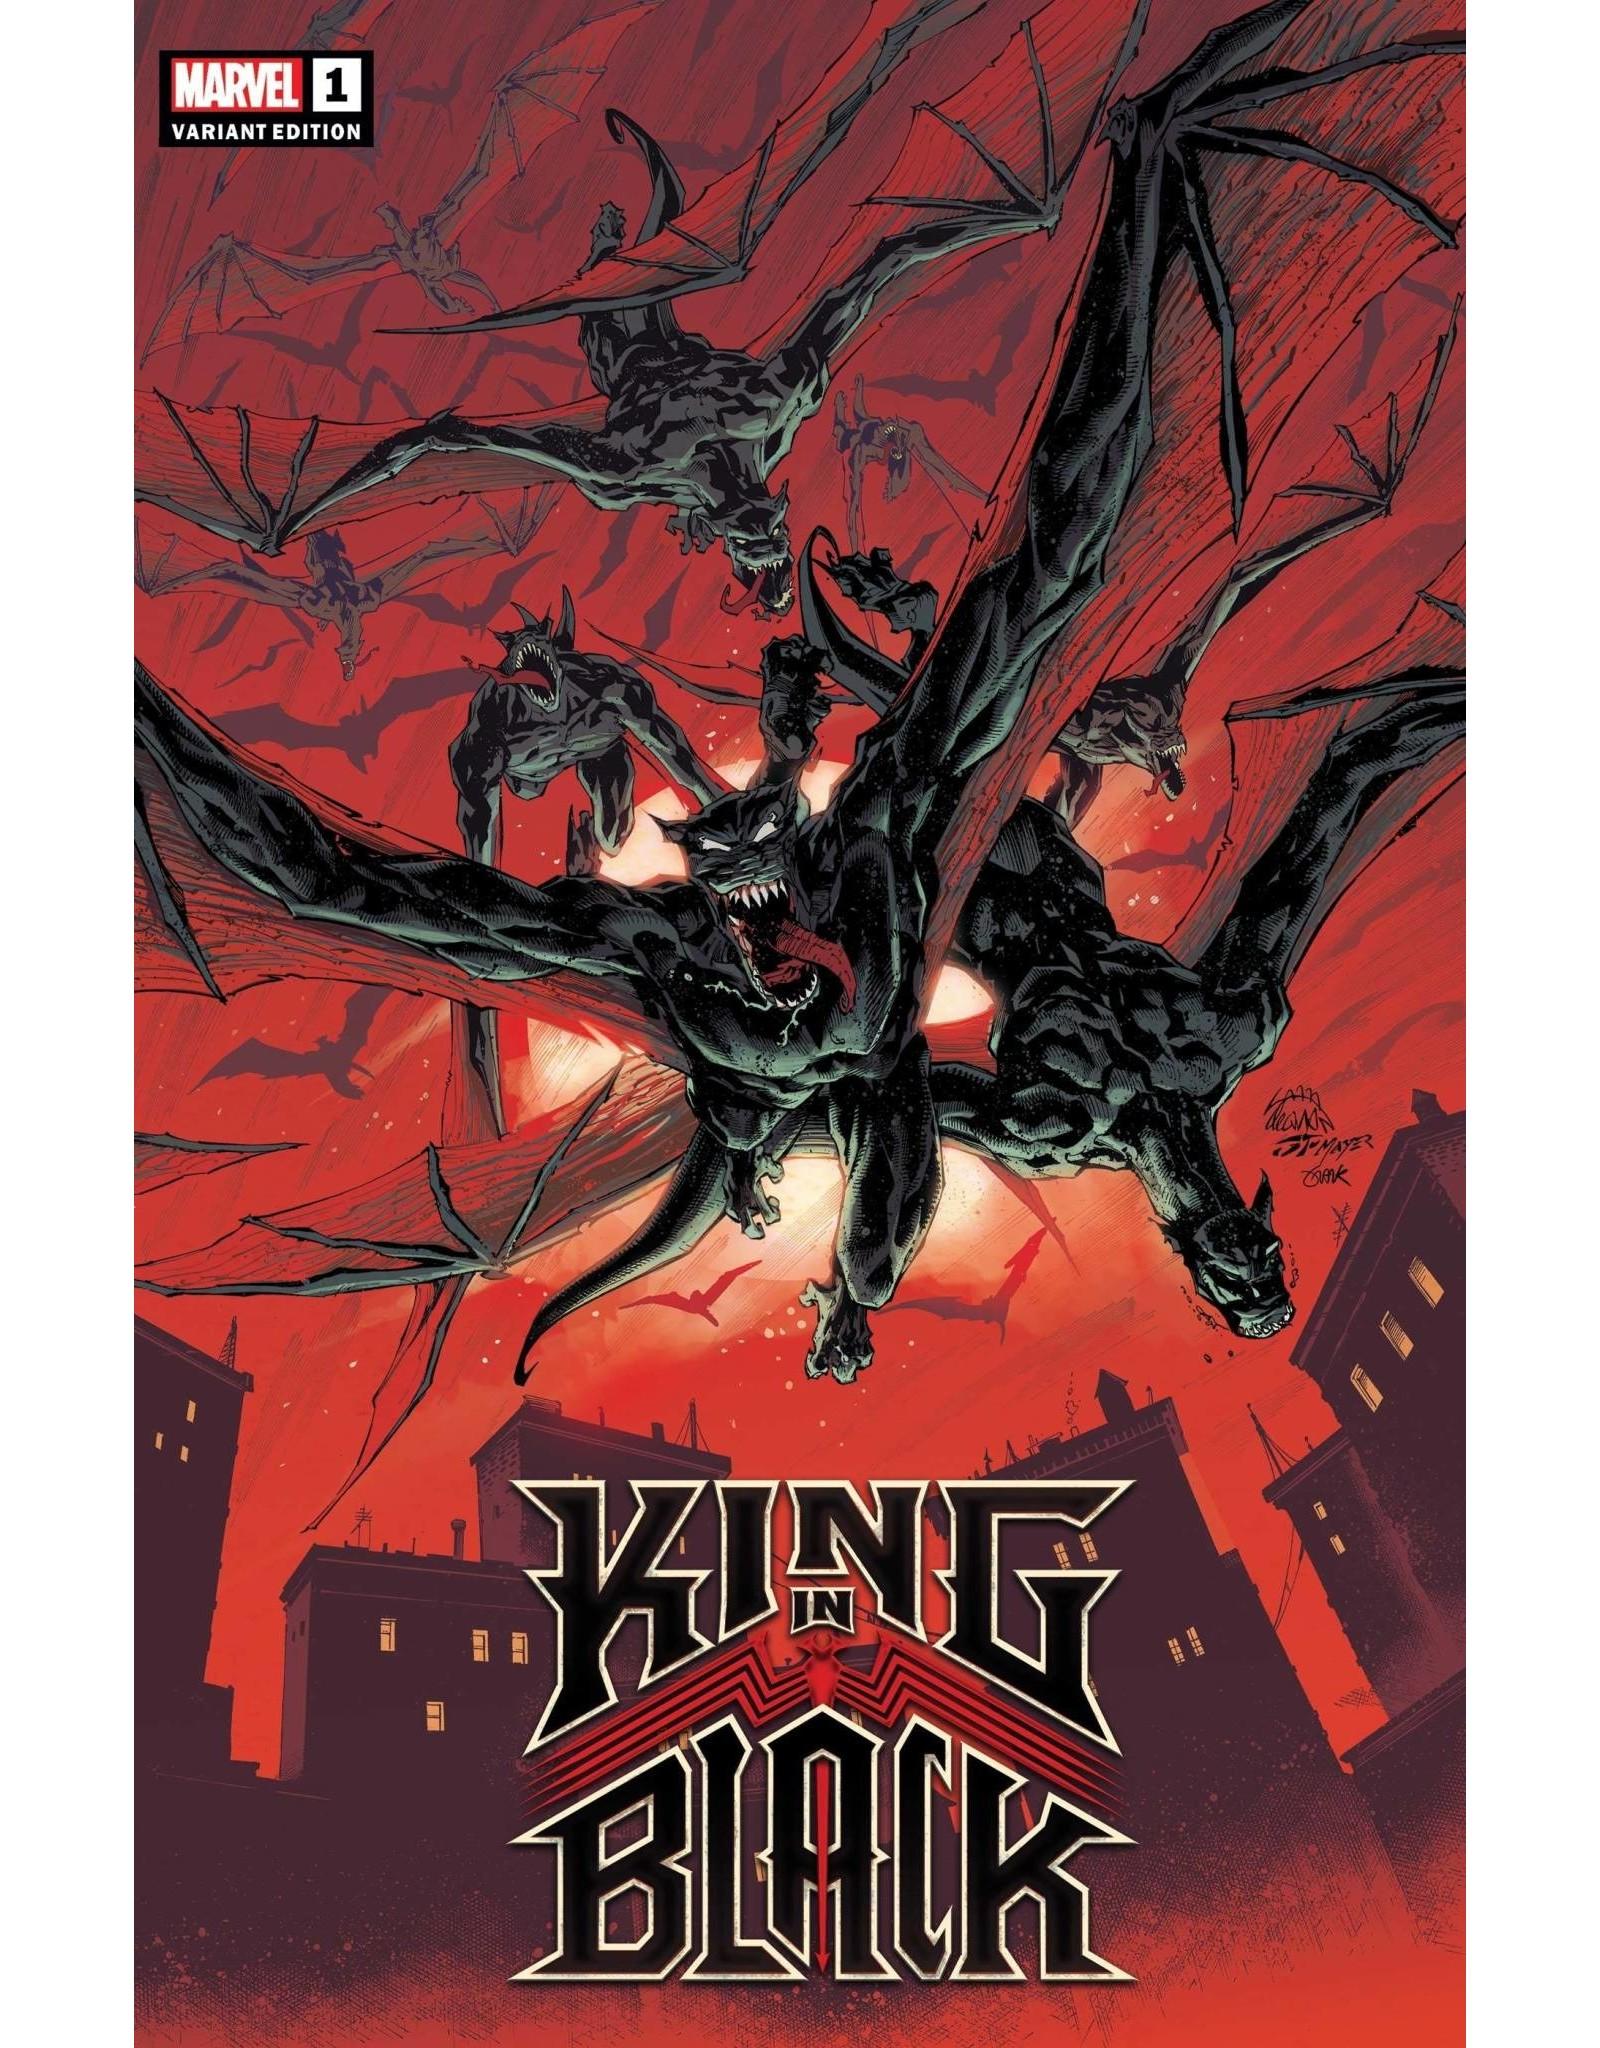 Marvel Comics KING IN BLACK #1 (OF 5) STEGMAN DARKNESS REIGNS VAR